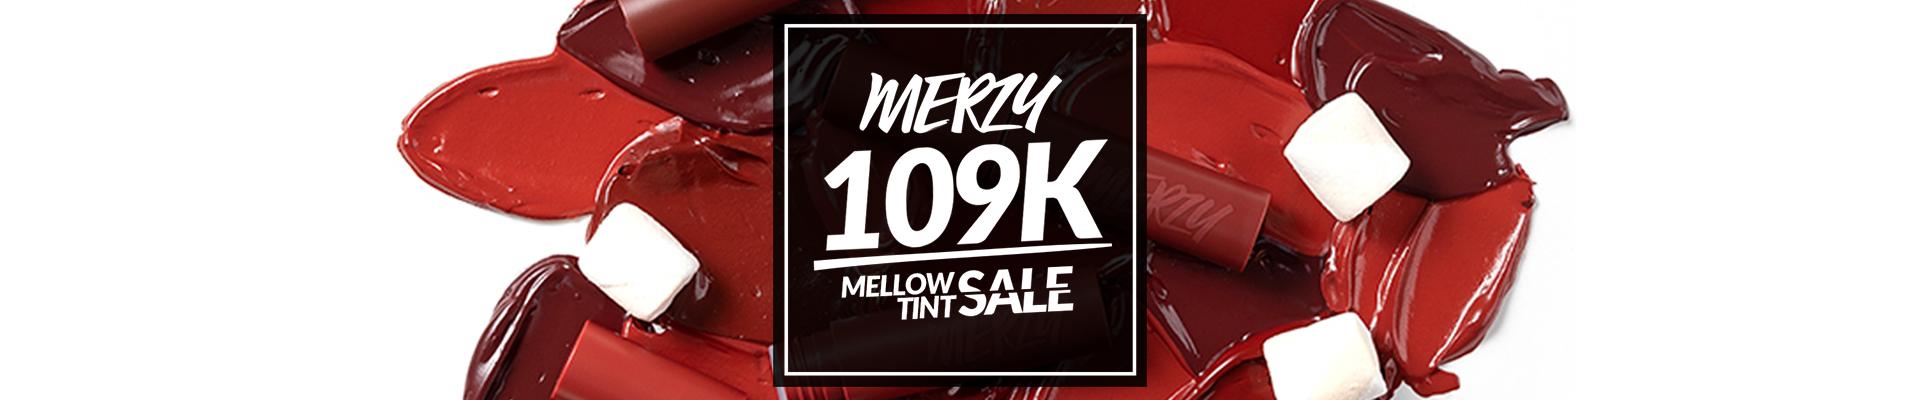 MERZY BITE THE BEAT MELLOW TINT SALE! 109K